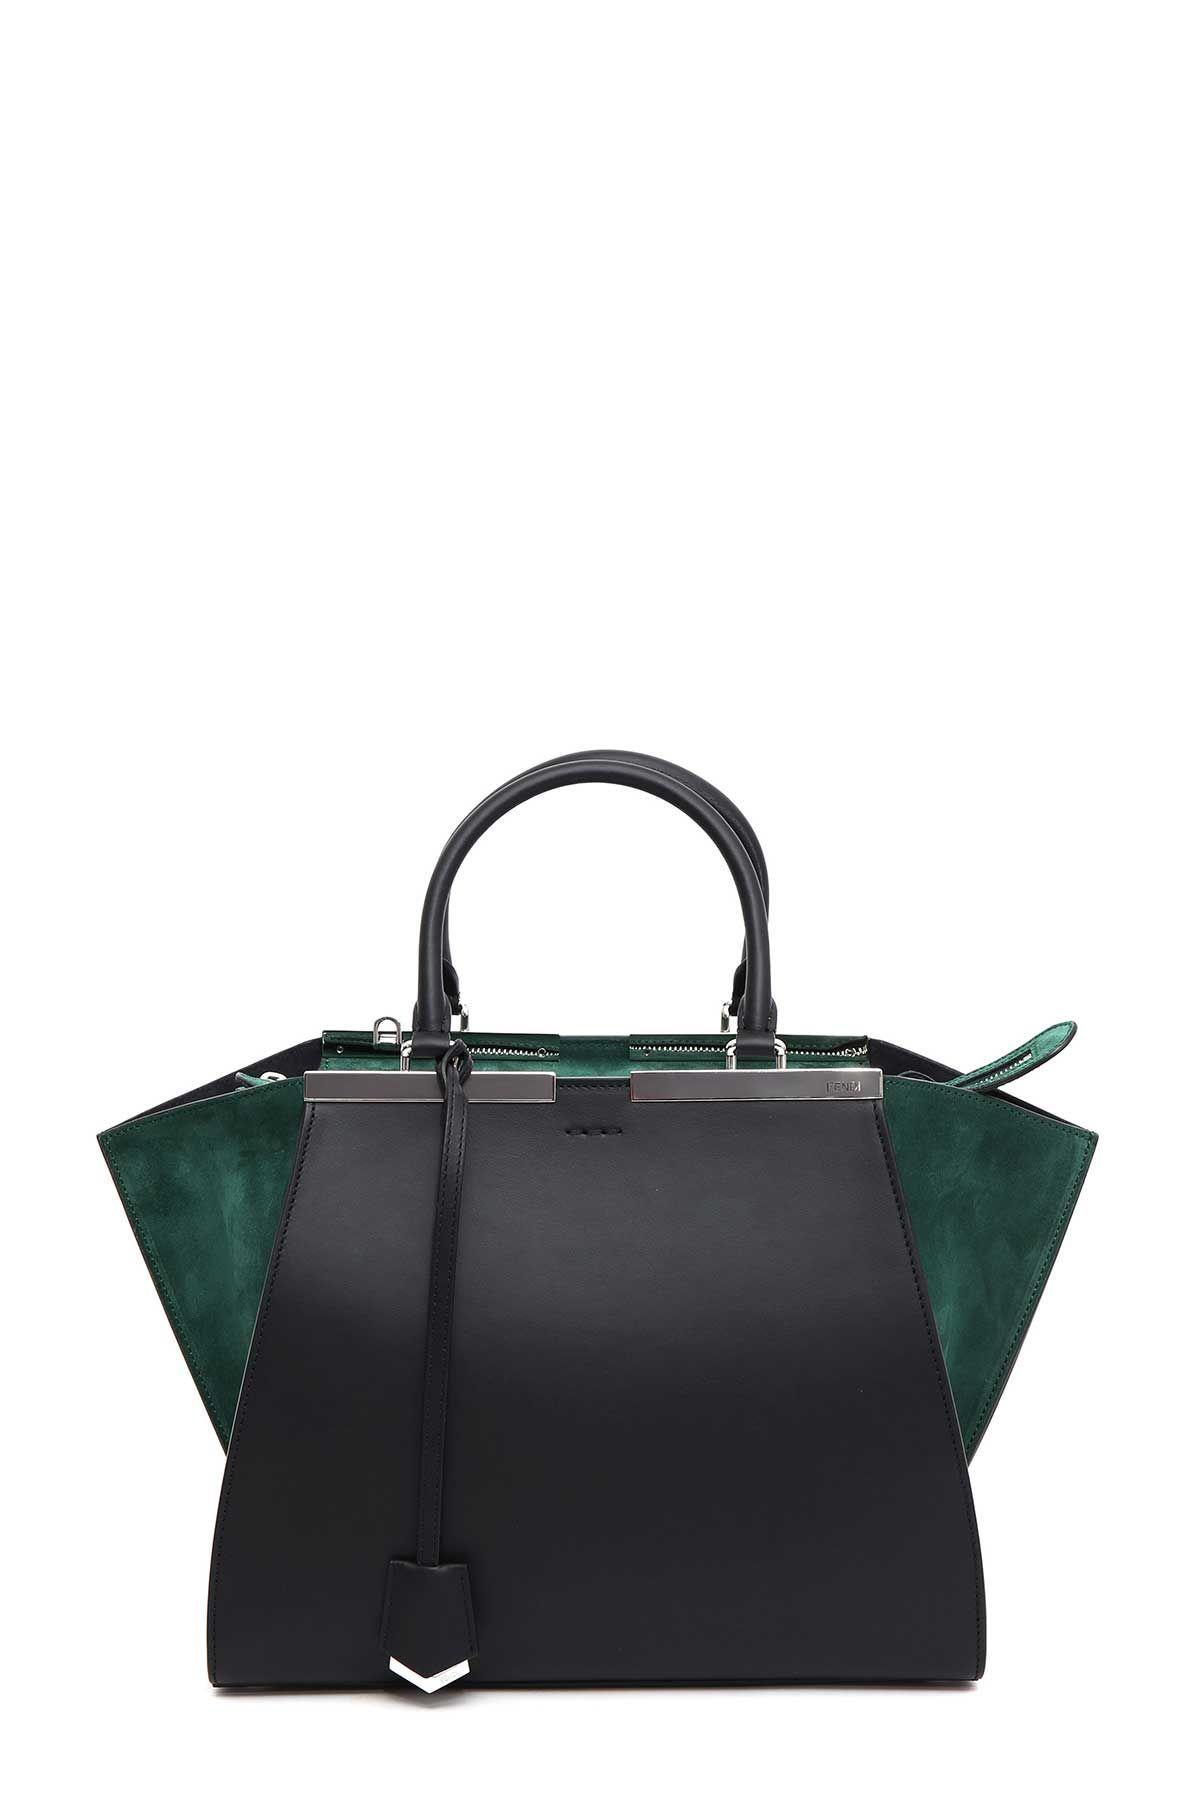 Fendi 3jours Handbag